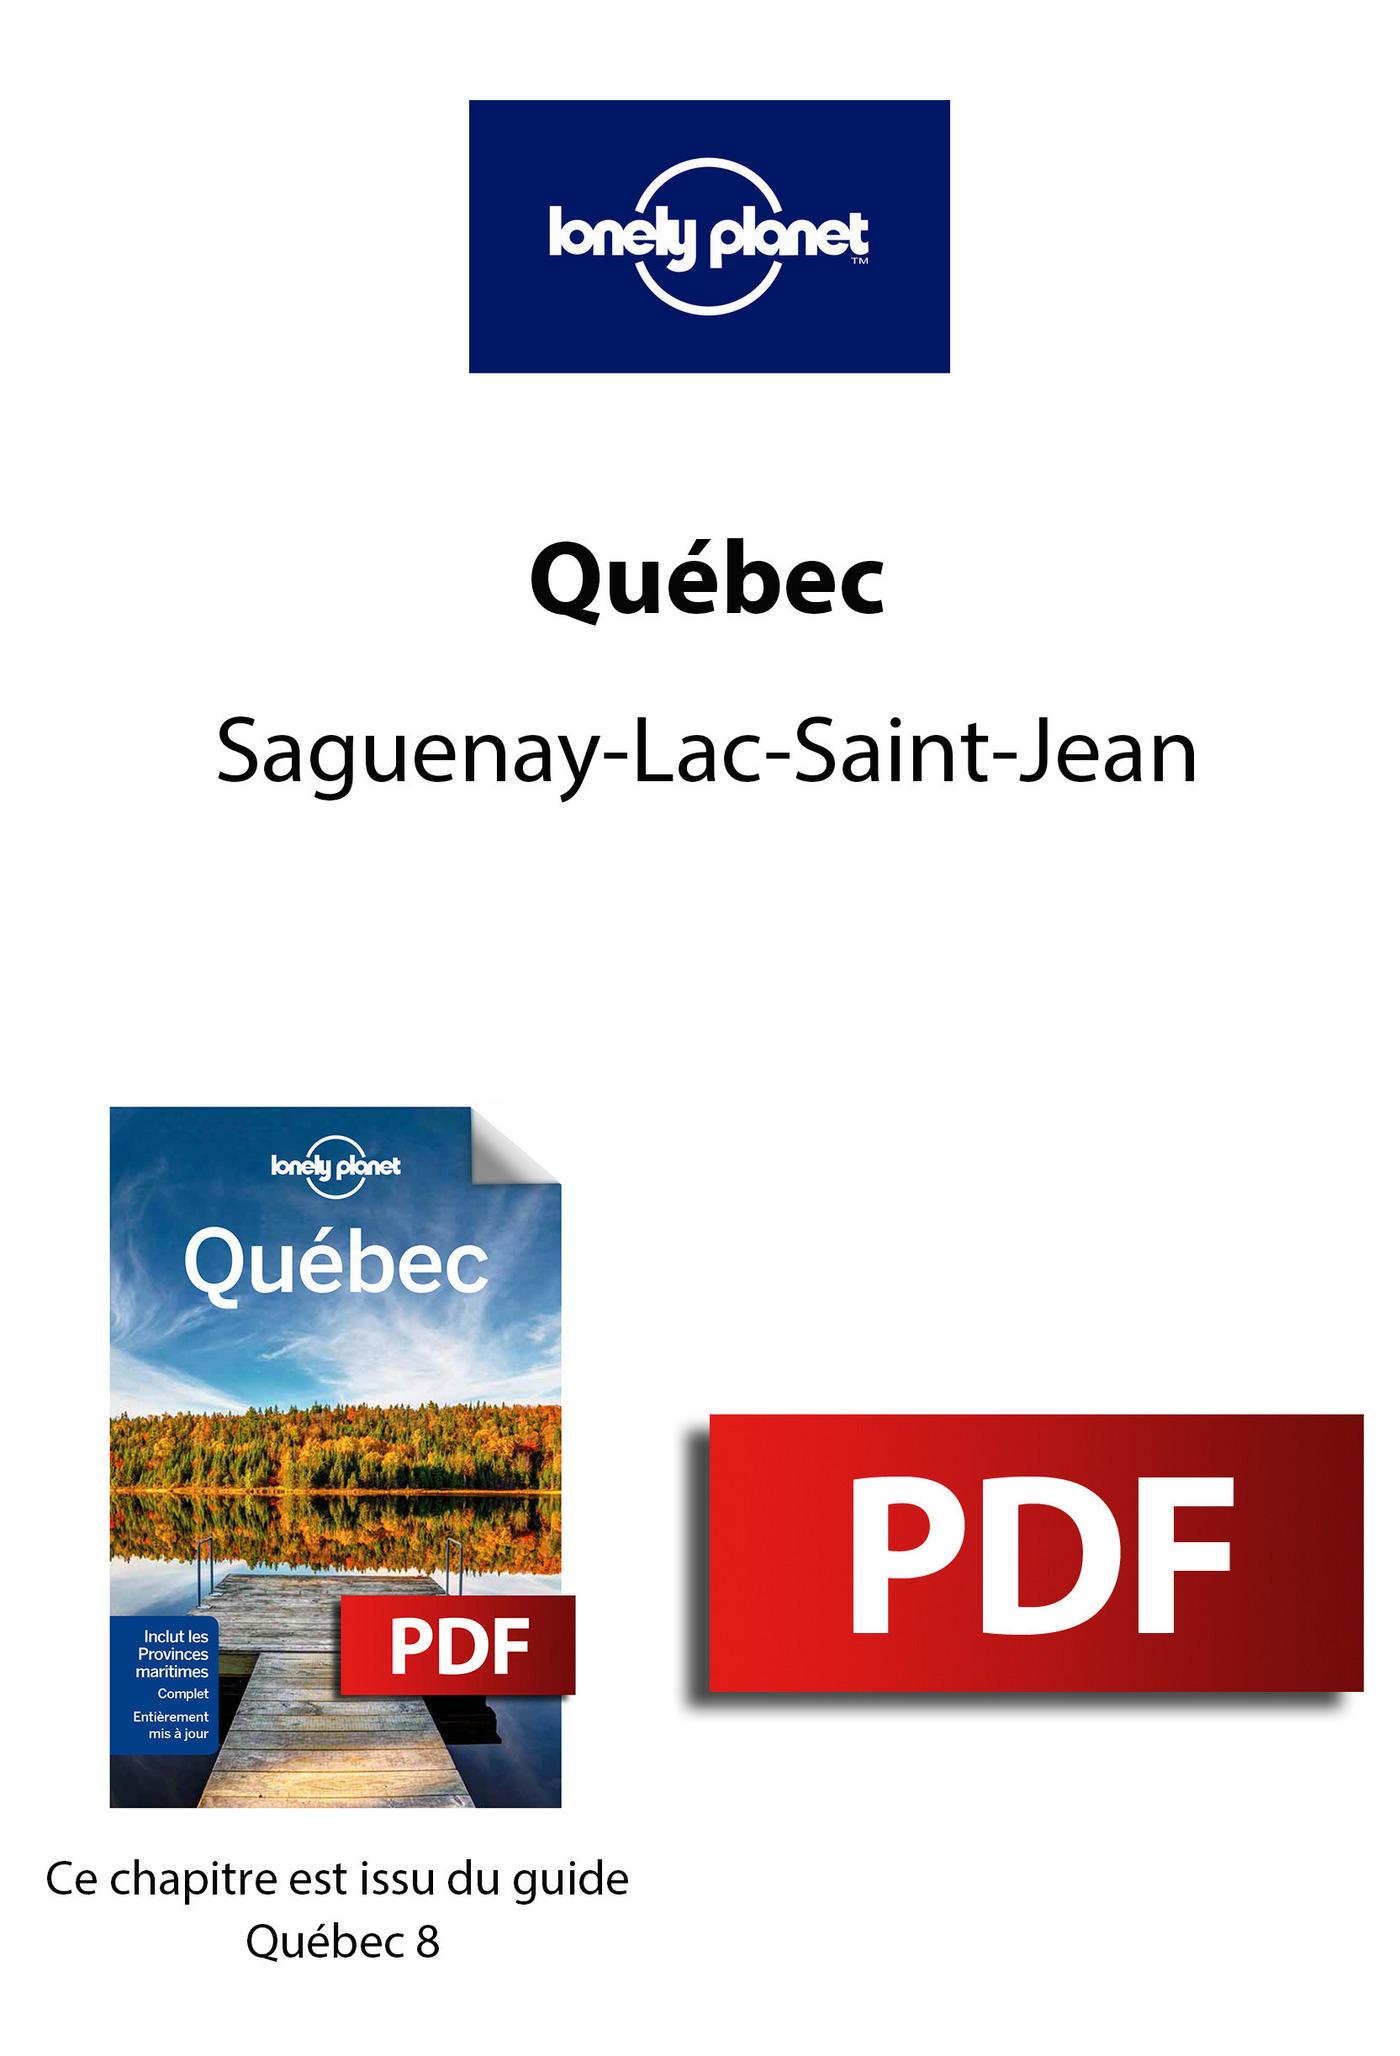 Québec - Saguenay-Lac-Saint-Jean